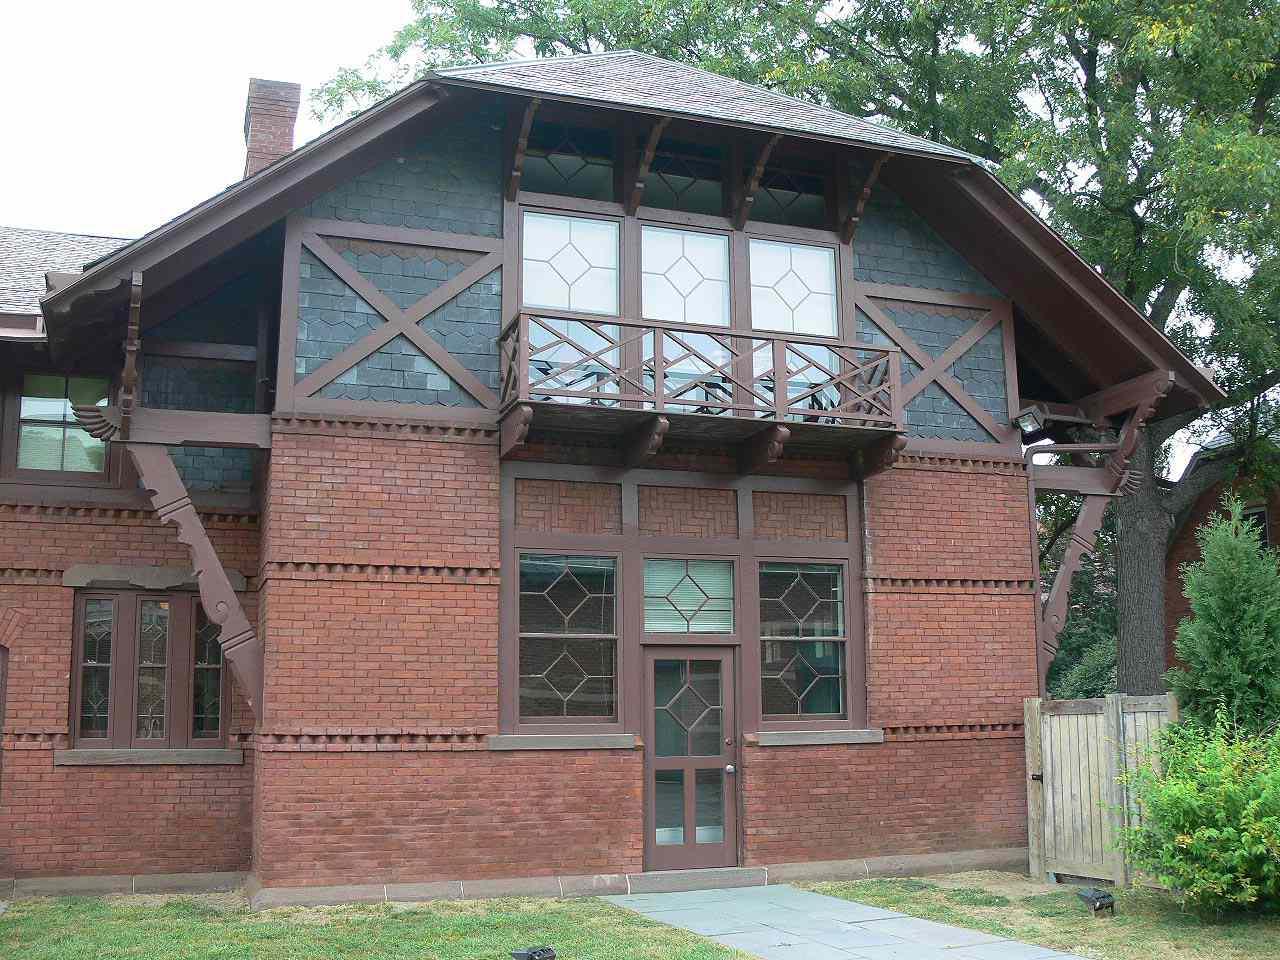 Mark Twain's carriage house had the same careful detailing as the main house.